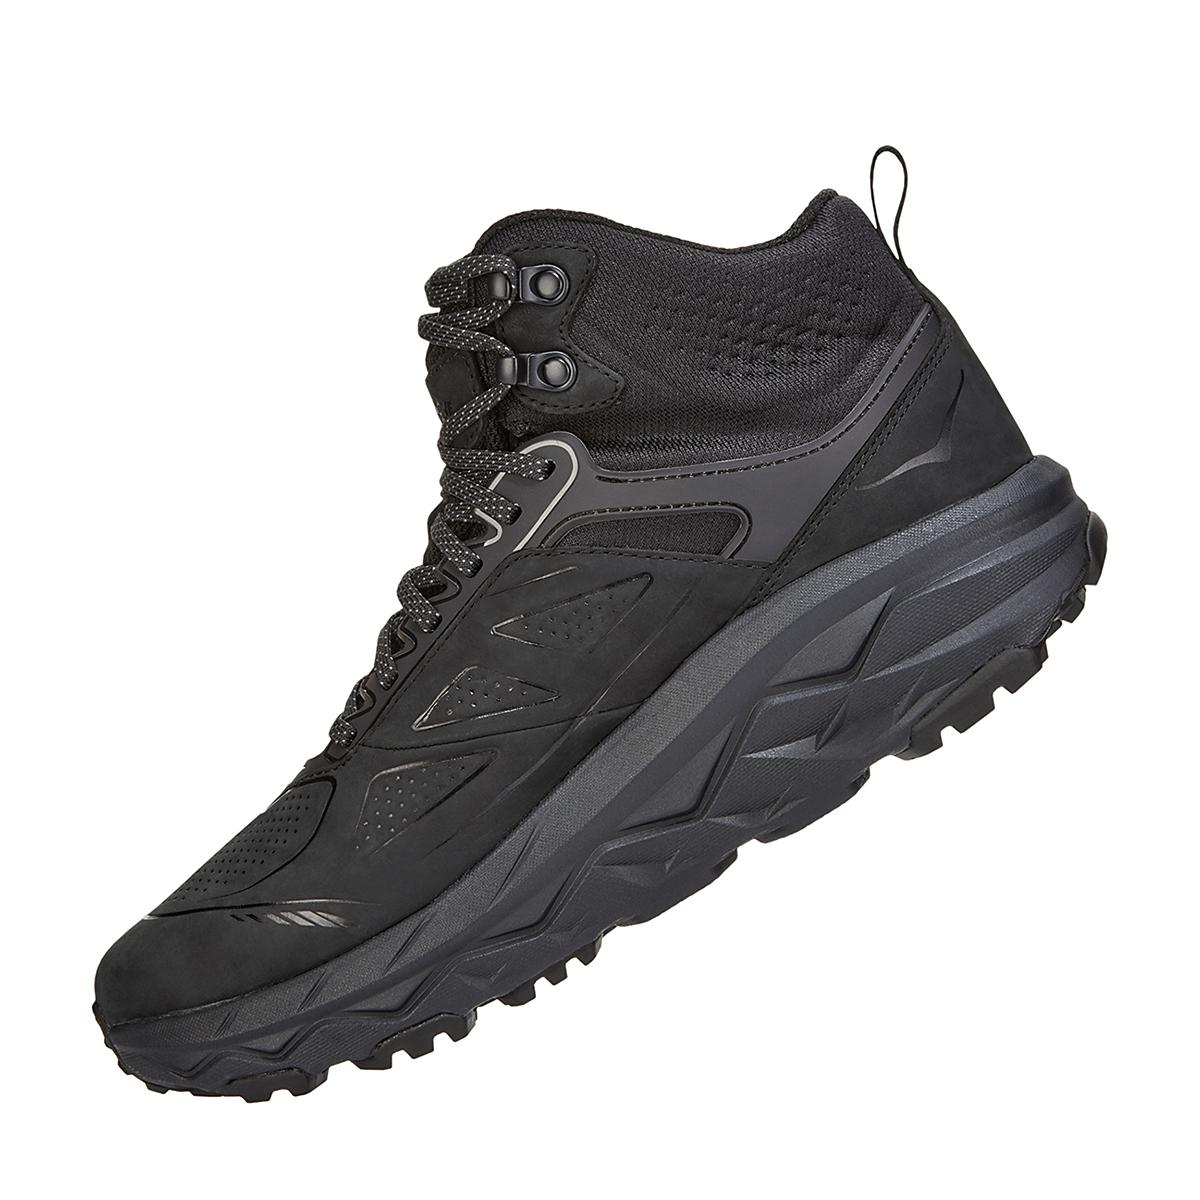 Men's Hoka One One Challenger Mid Gore-Tex Trail Running Shoe - Color: Black (Regular Width) - Size: 11, Black, large, image 4